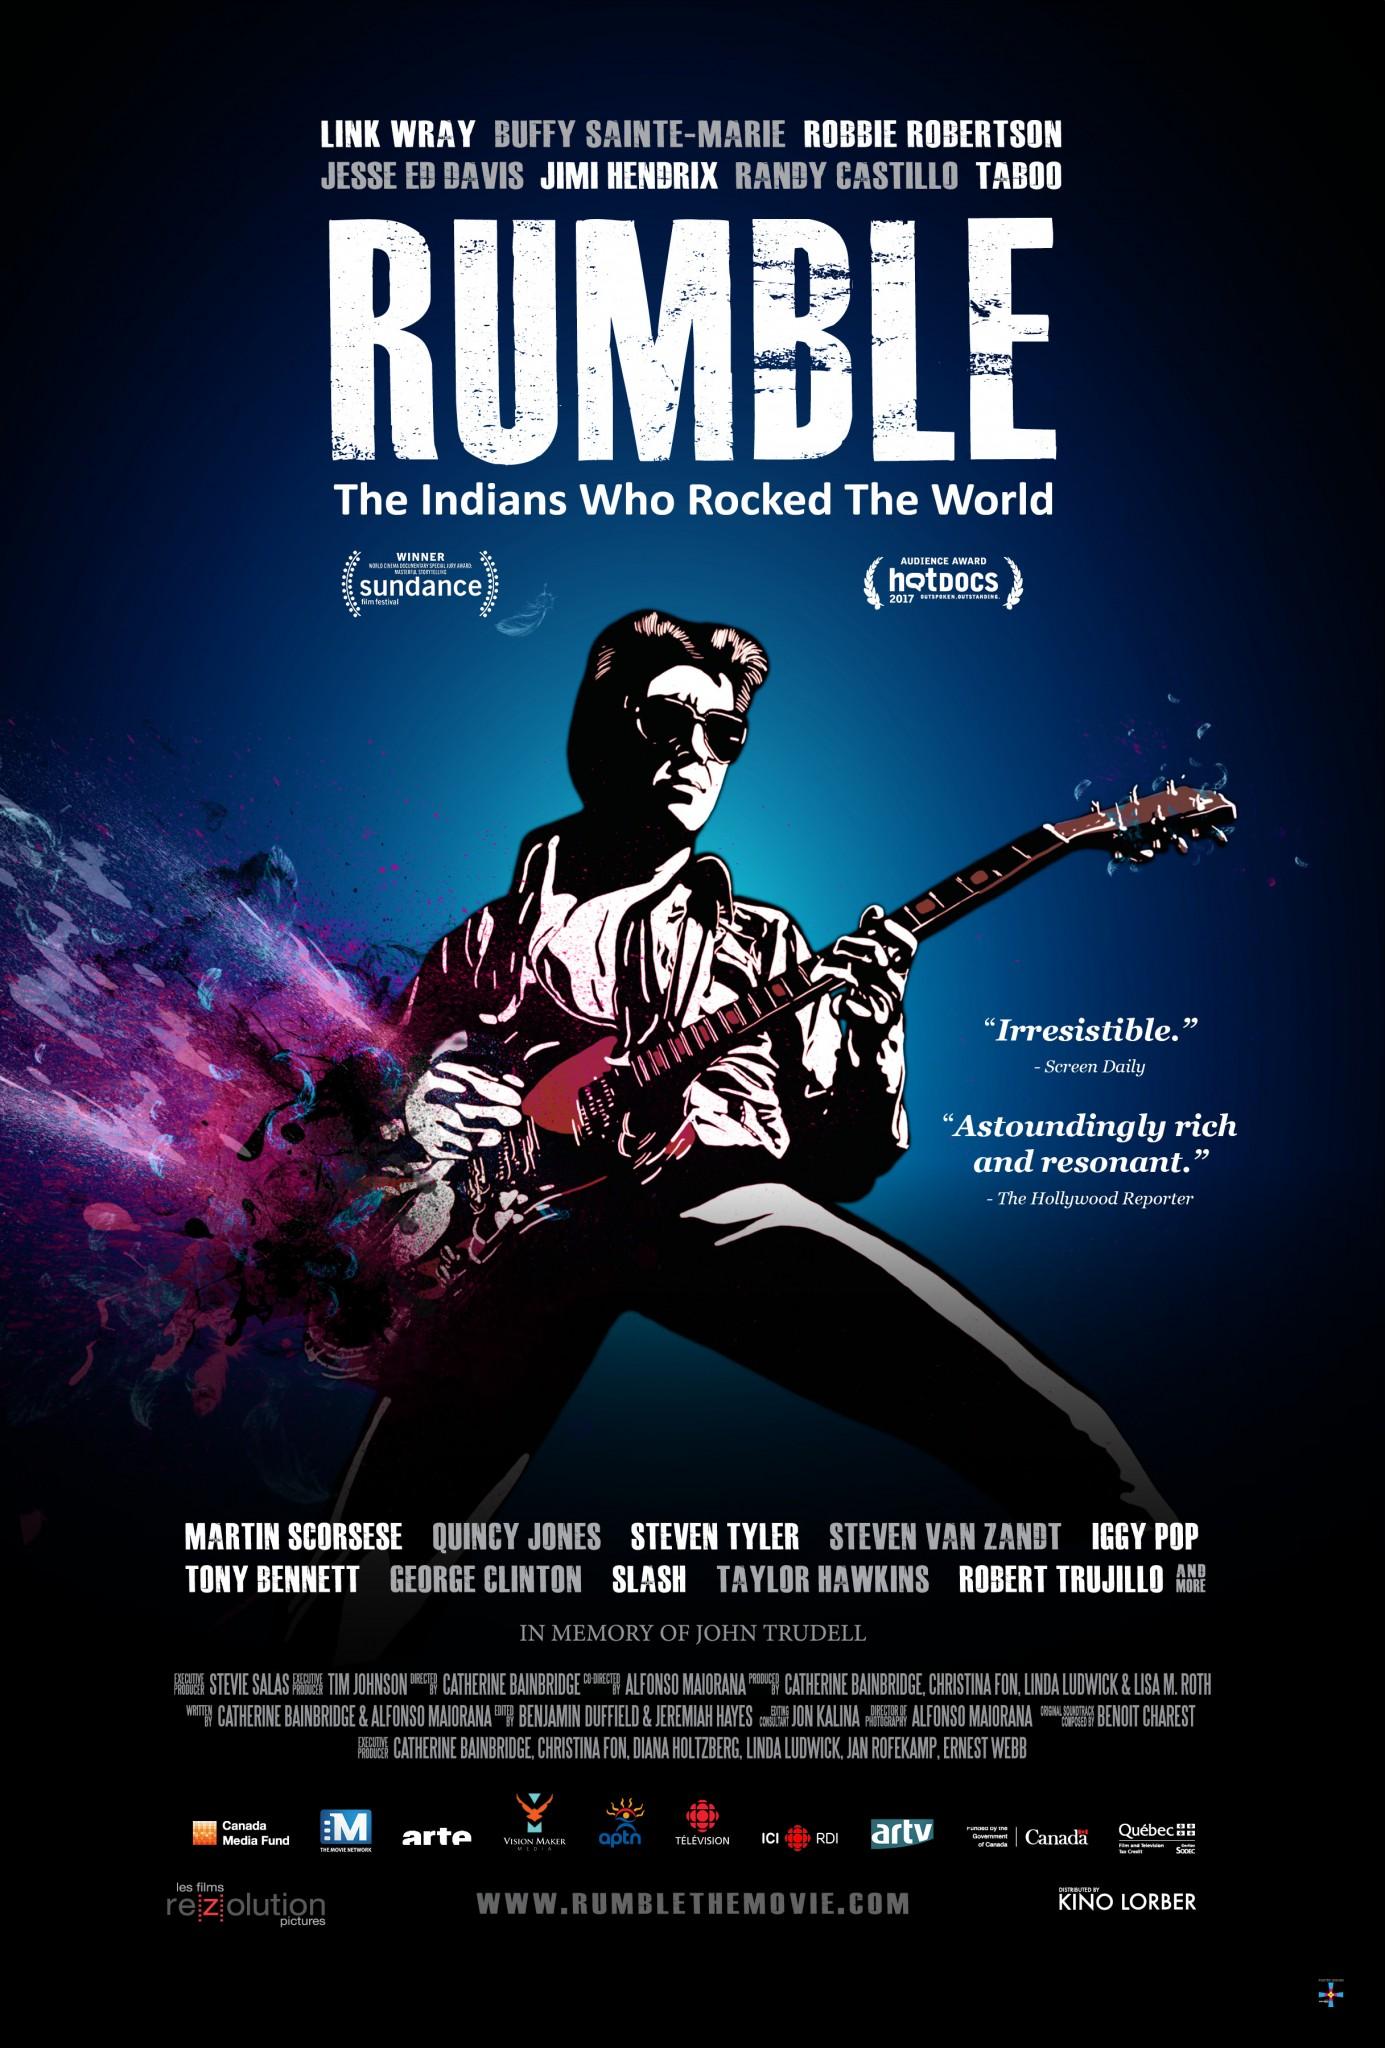 RUMBLE Poster (2434x3600)v2 FINAL